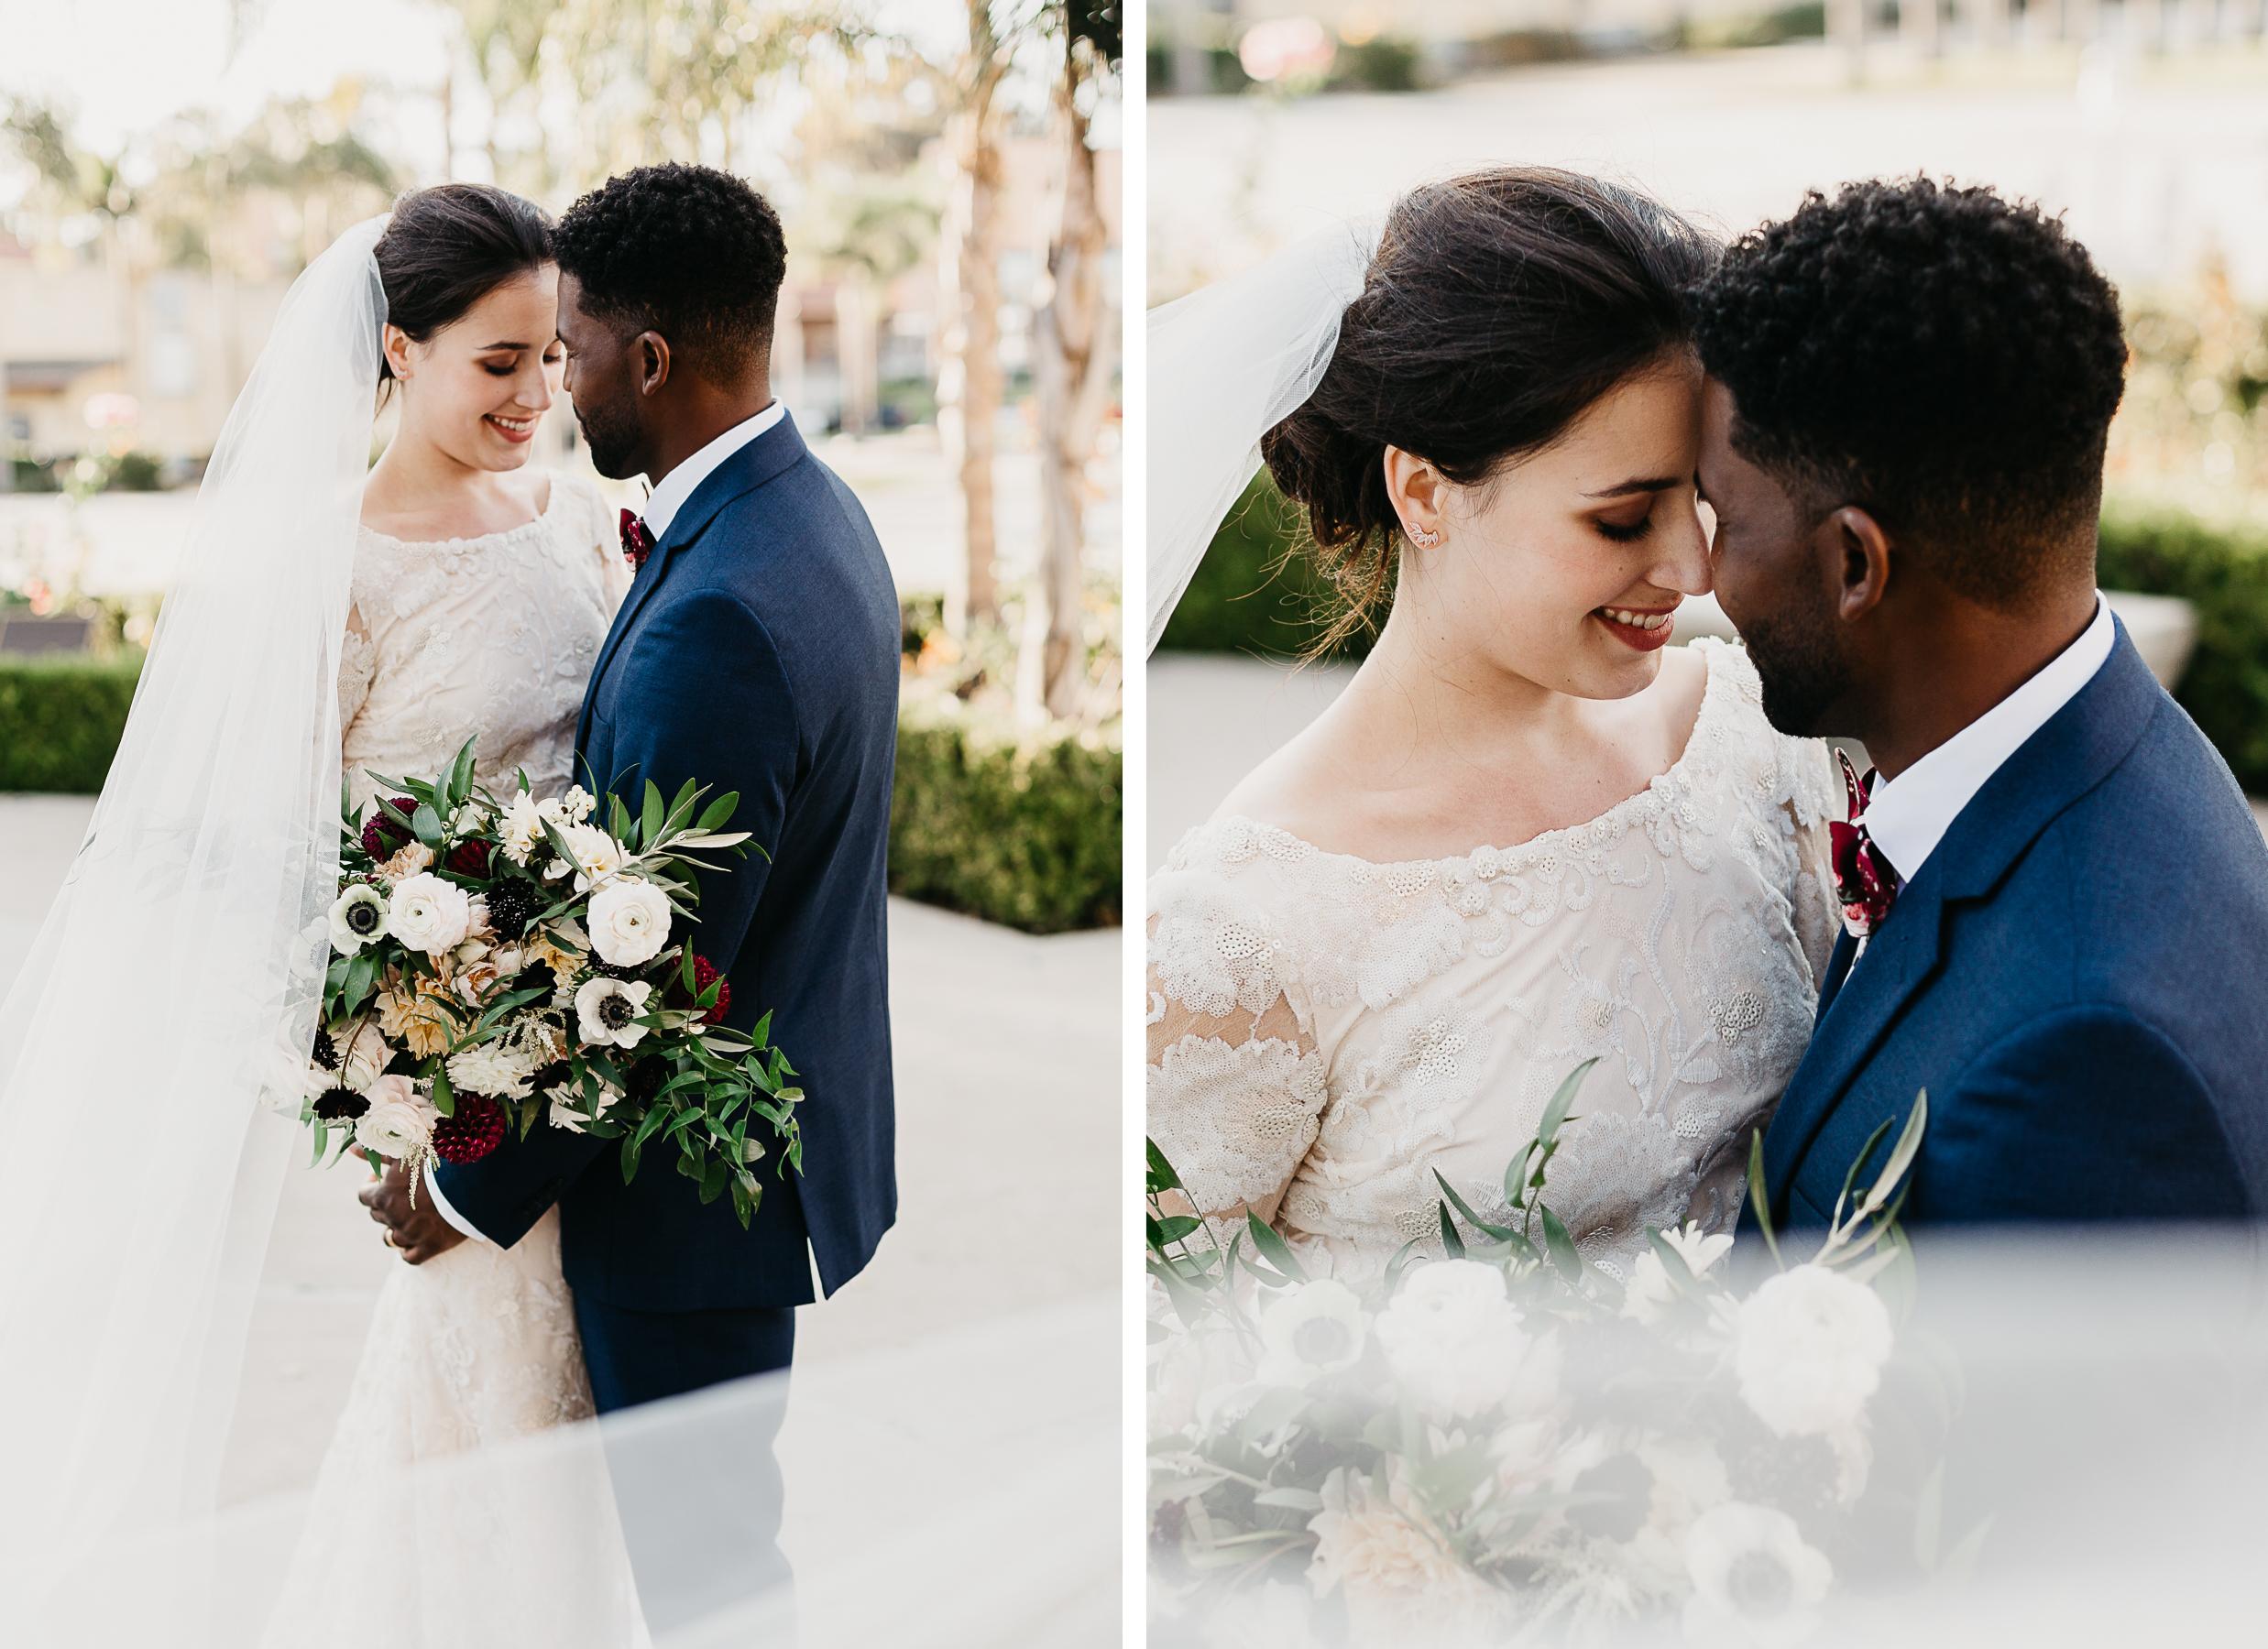 austin wedding photographer 16.jpg